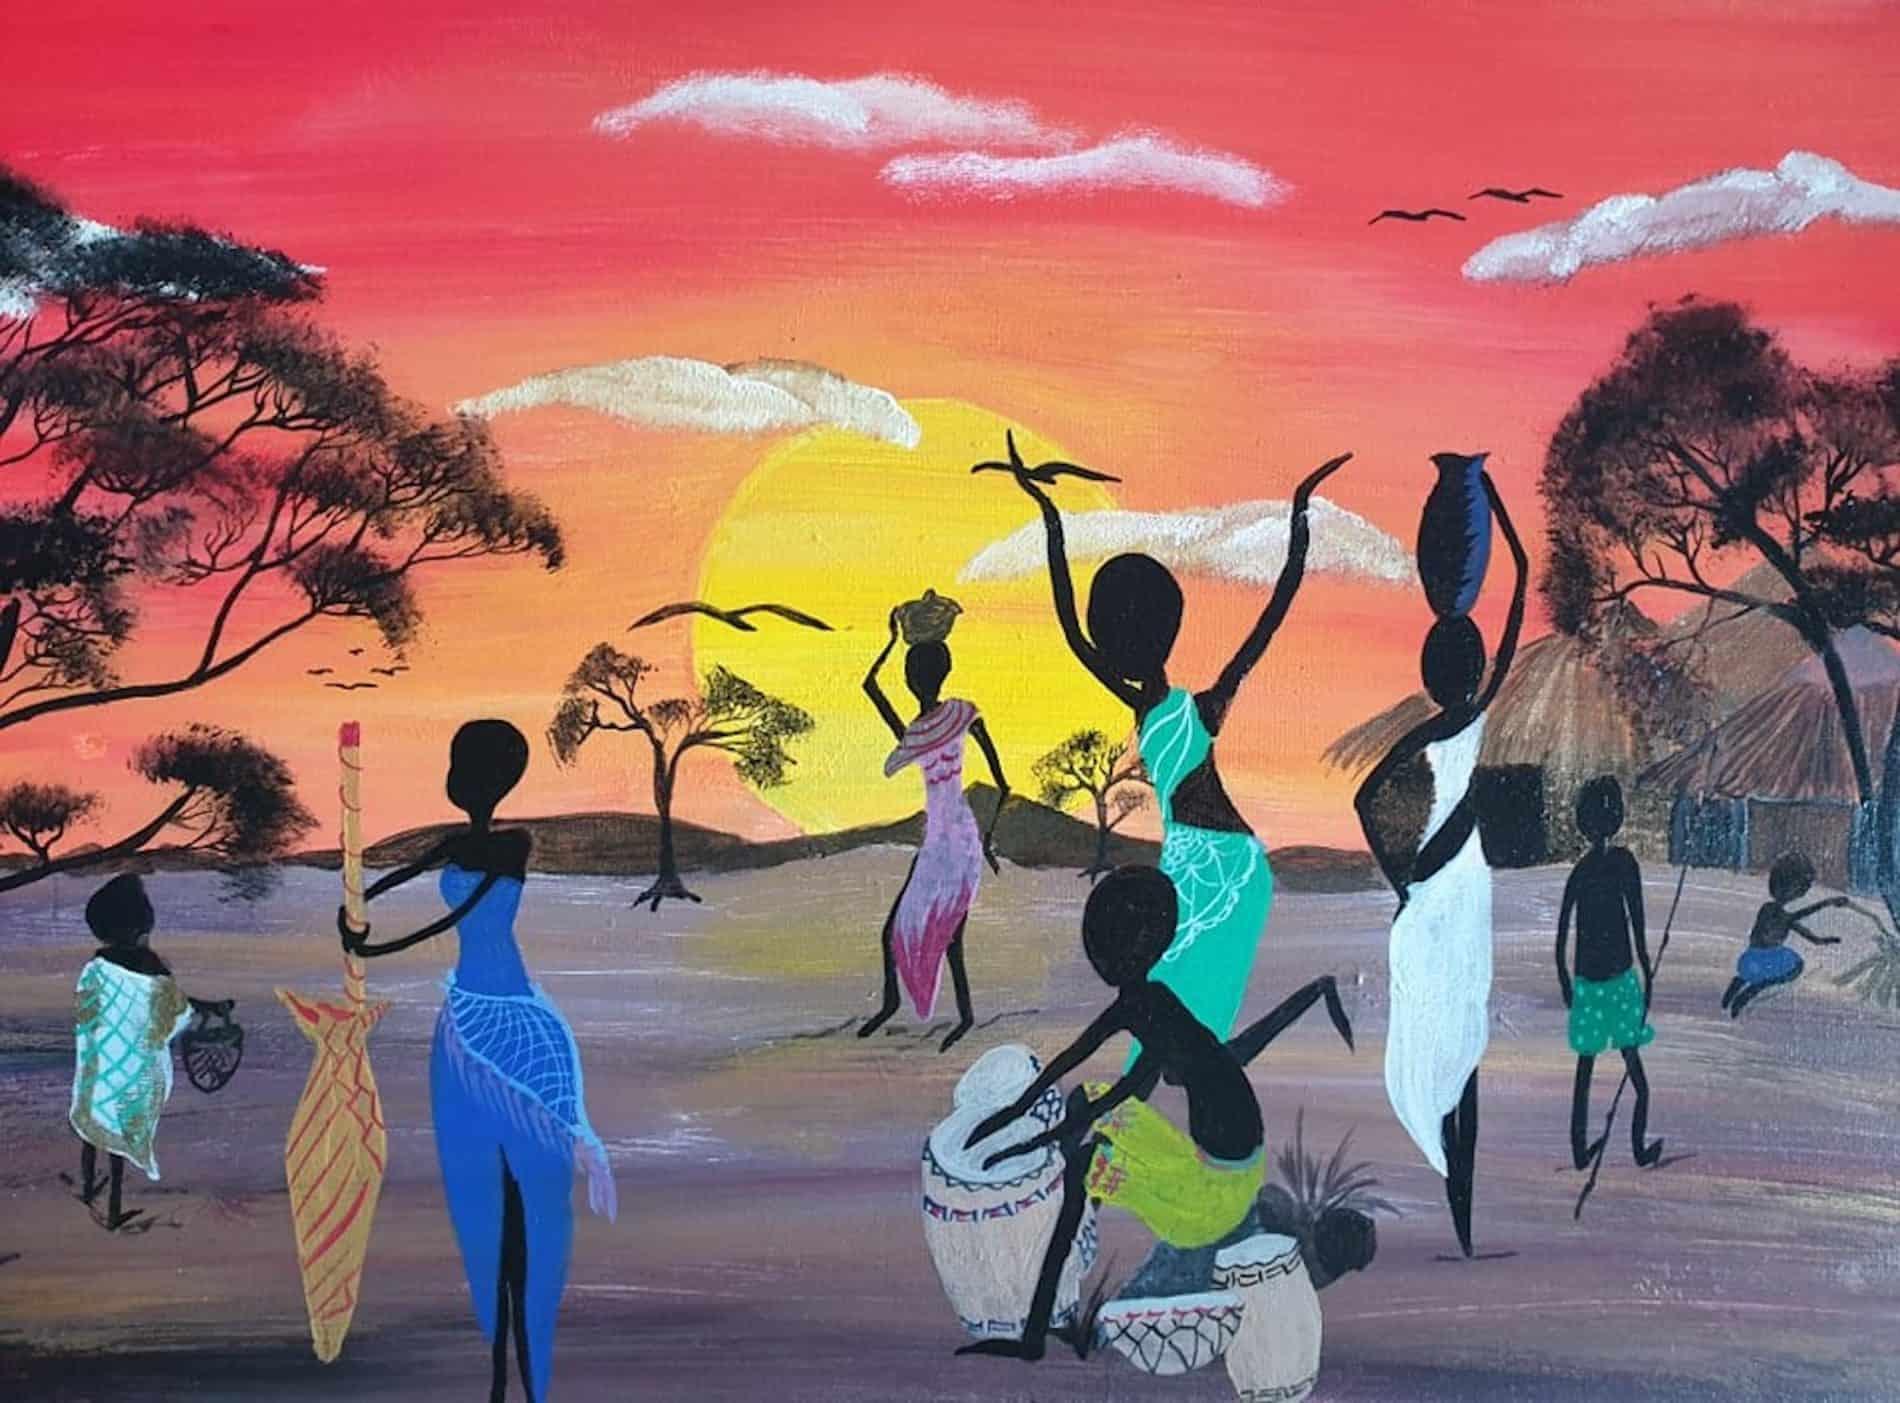 mauritian-artist-corinne-felicite-tribute-to-the-sun